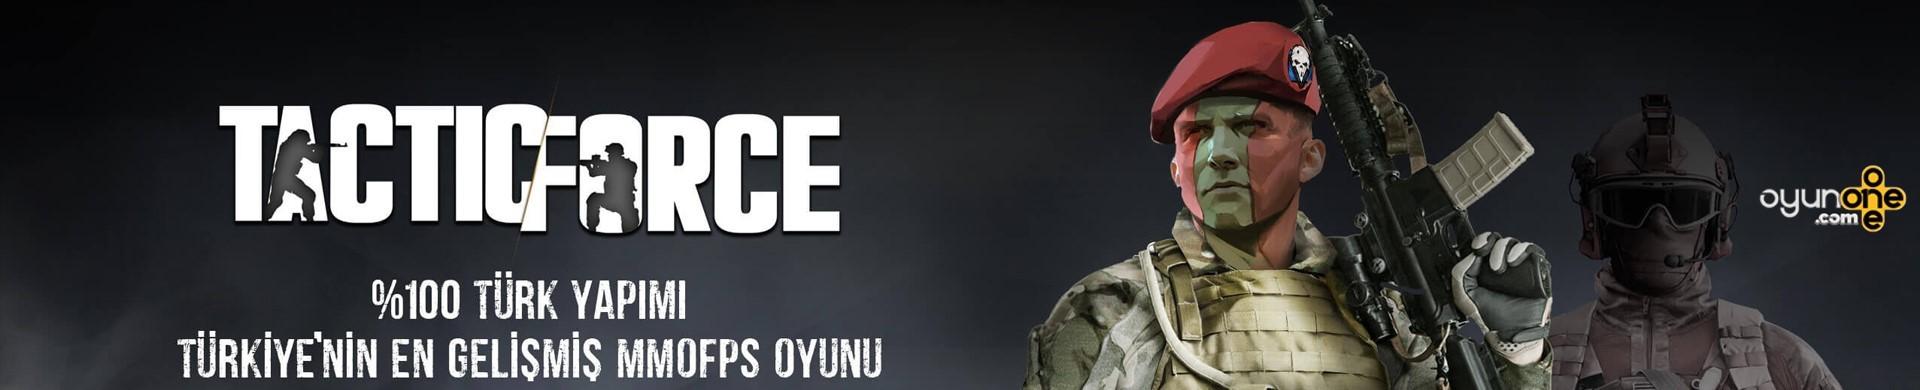 Hemen Kayıt ol Hediyeni Kap Tactic Force